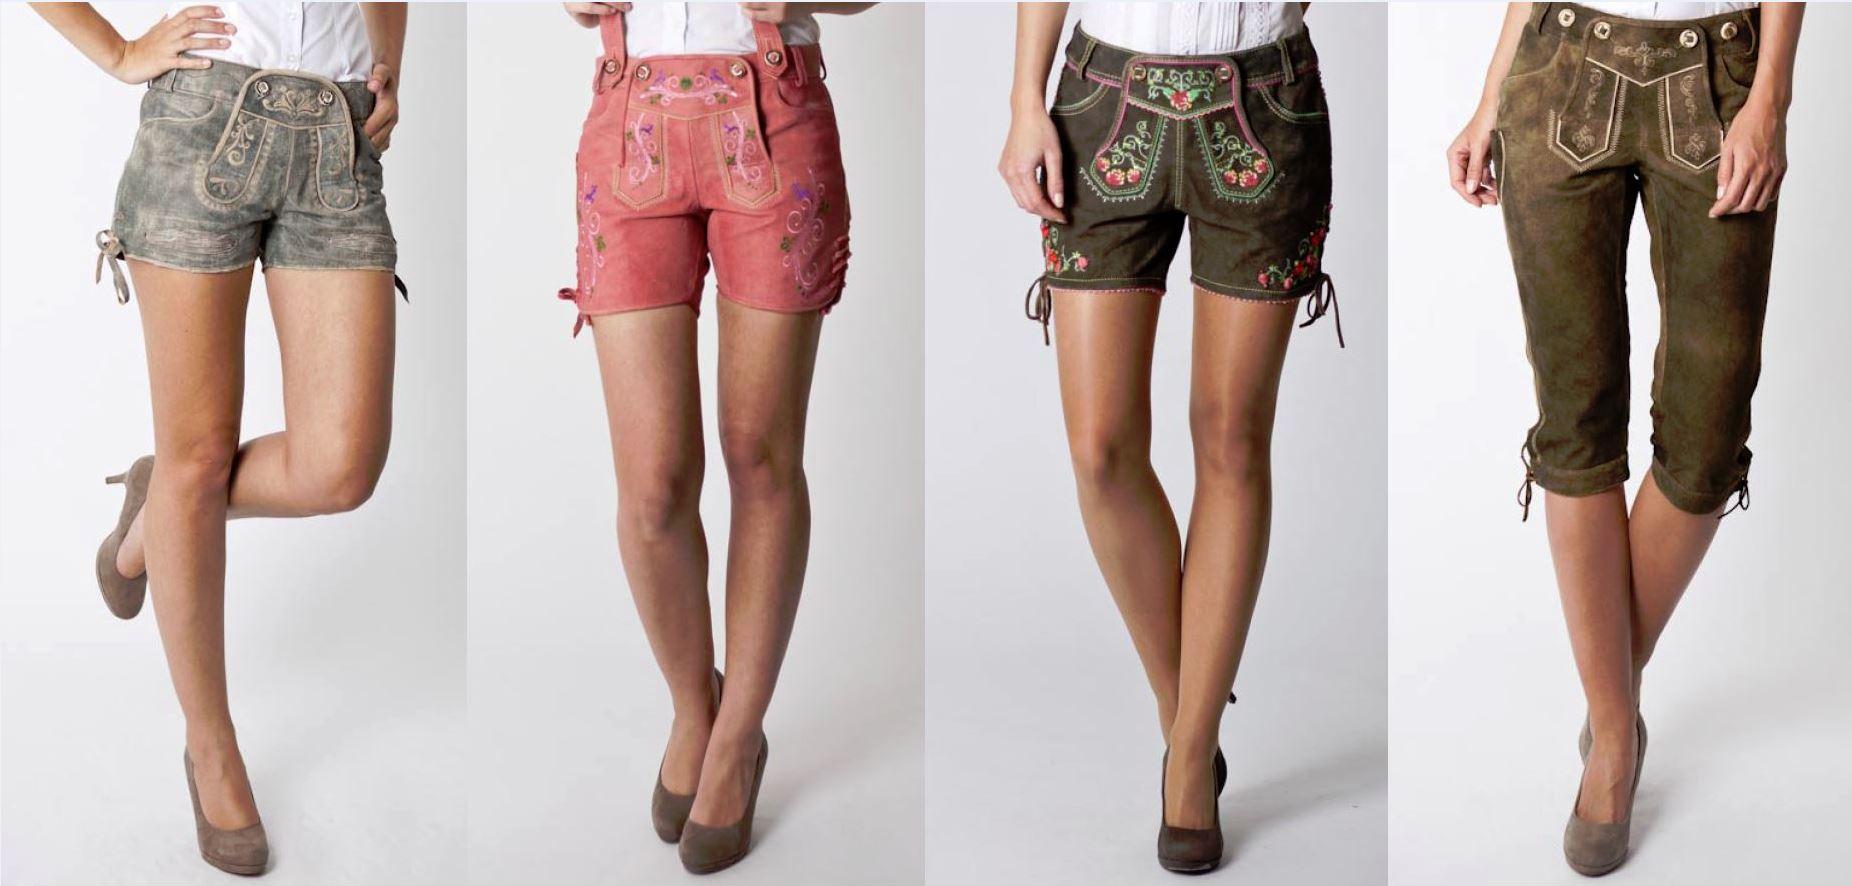 2954818a6961c Trendy Damen Lederhosen: Super Styling Tipps I Magazin